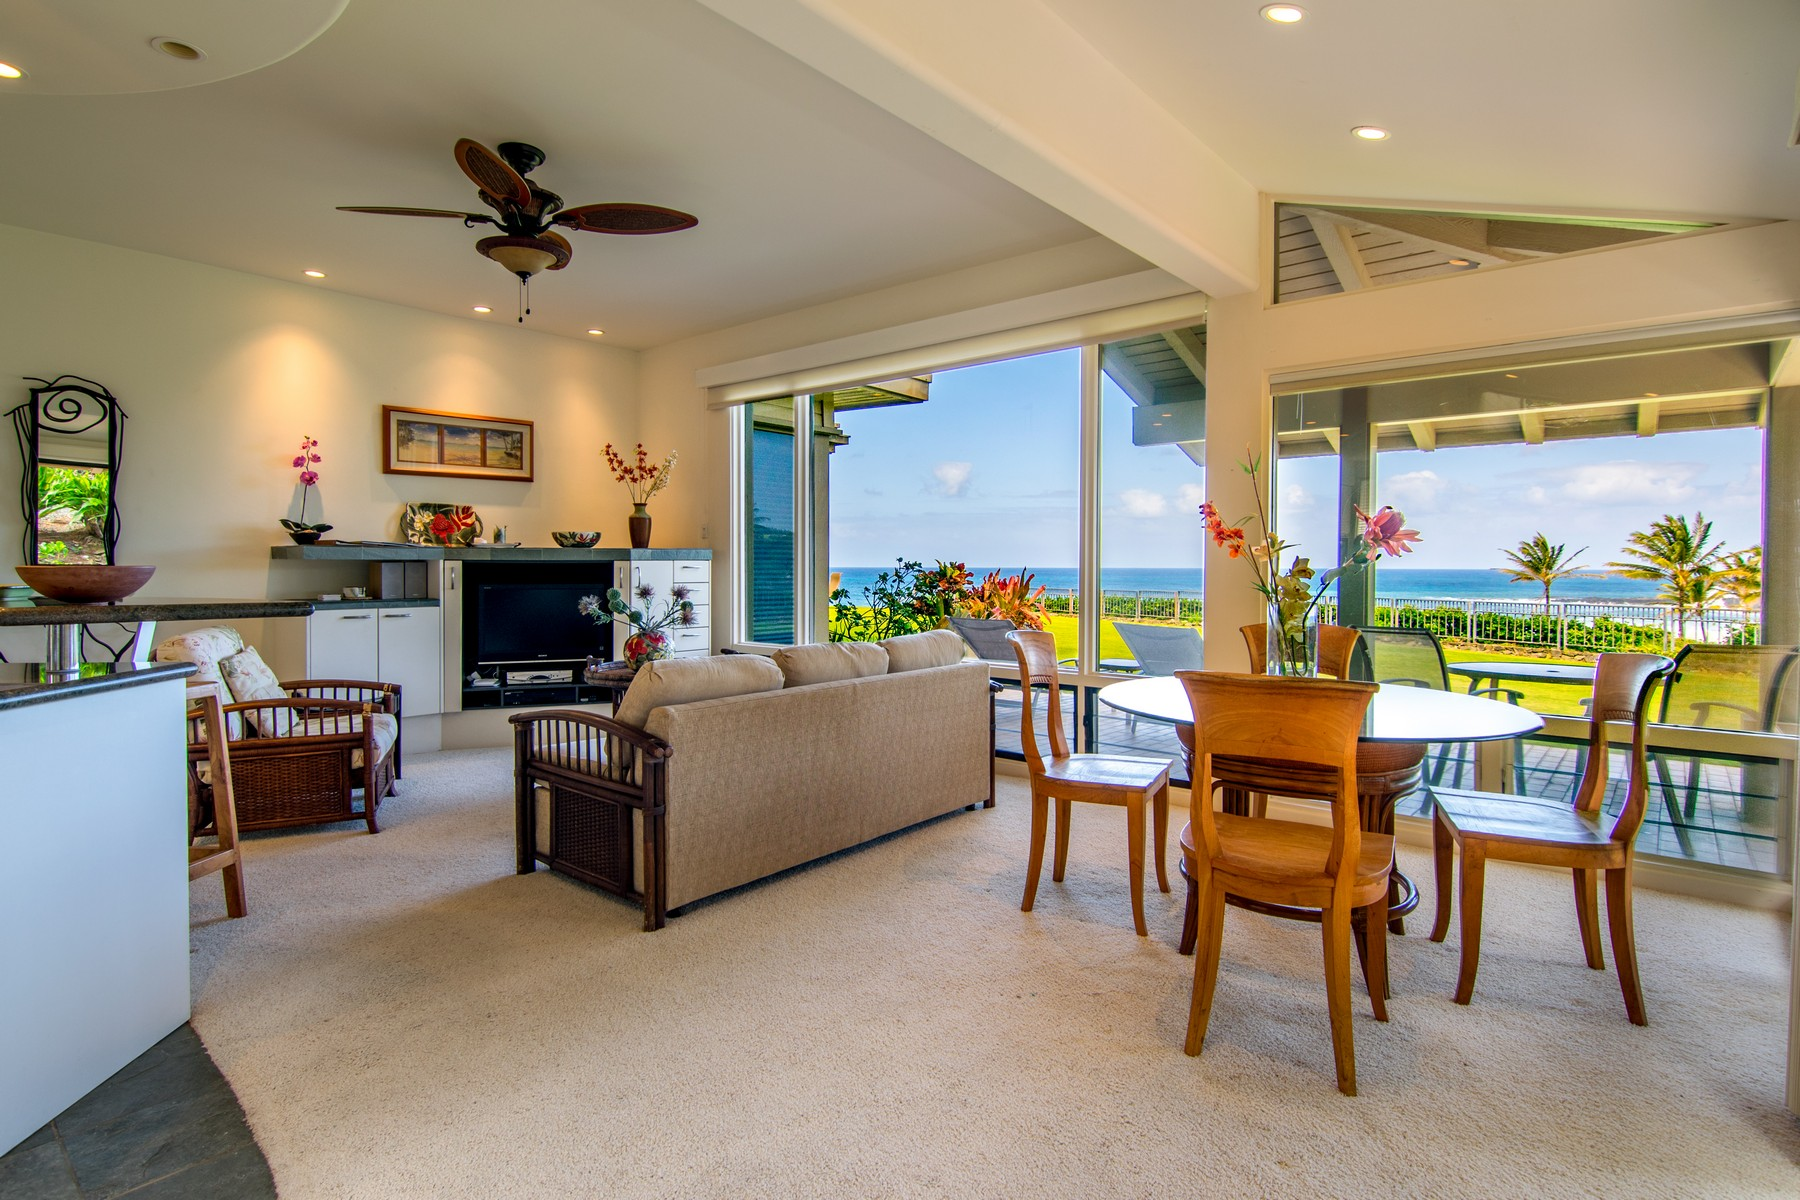 Condominium for Sale at Kapalua Bay Villa 500 Bay Drive, Kapalua Bay Villa 19G5 Kapalua, Hawaii, 96761 United States